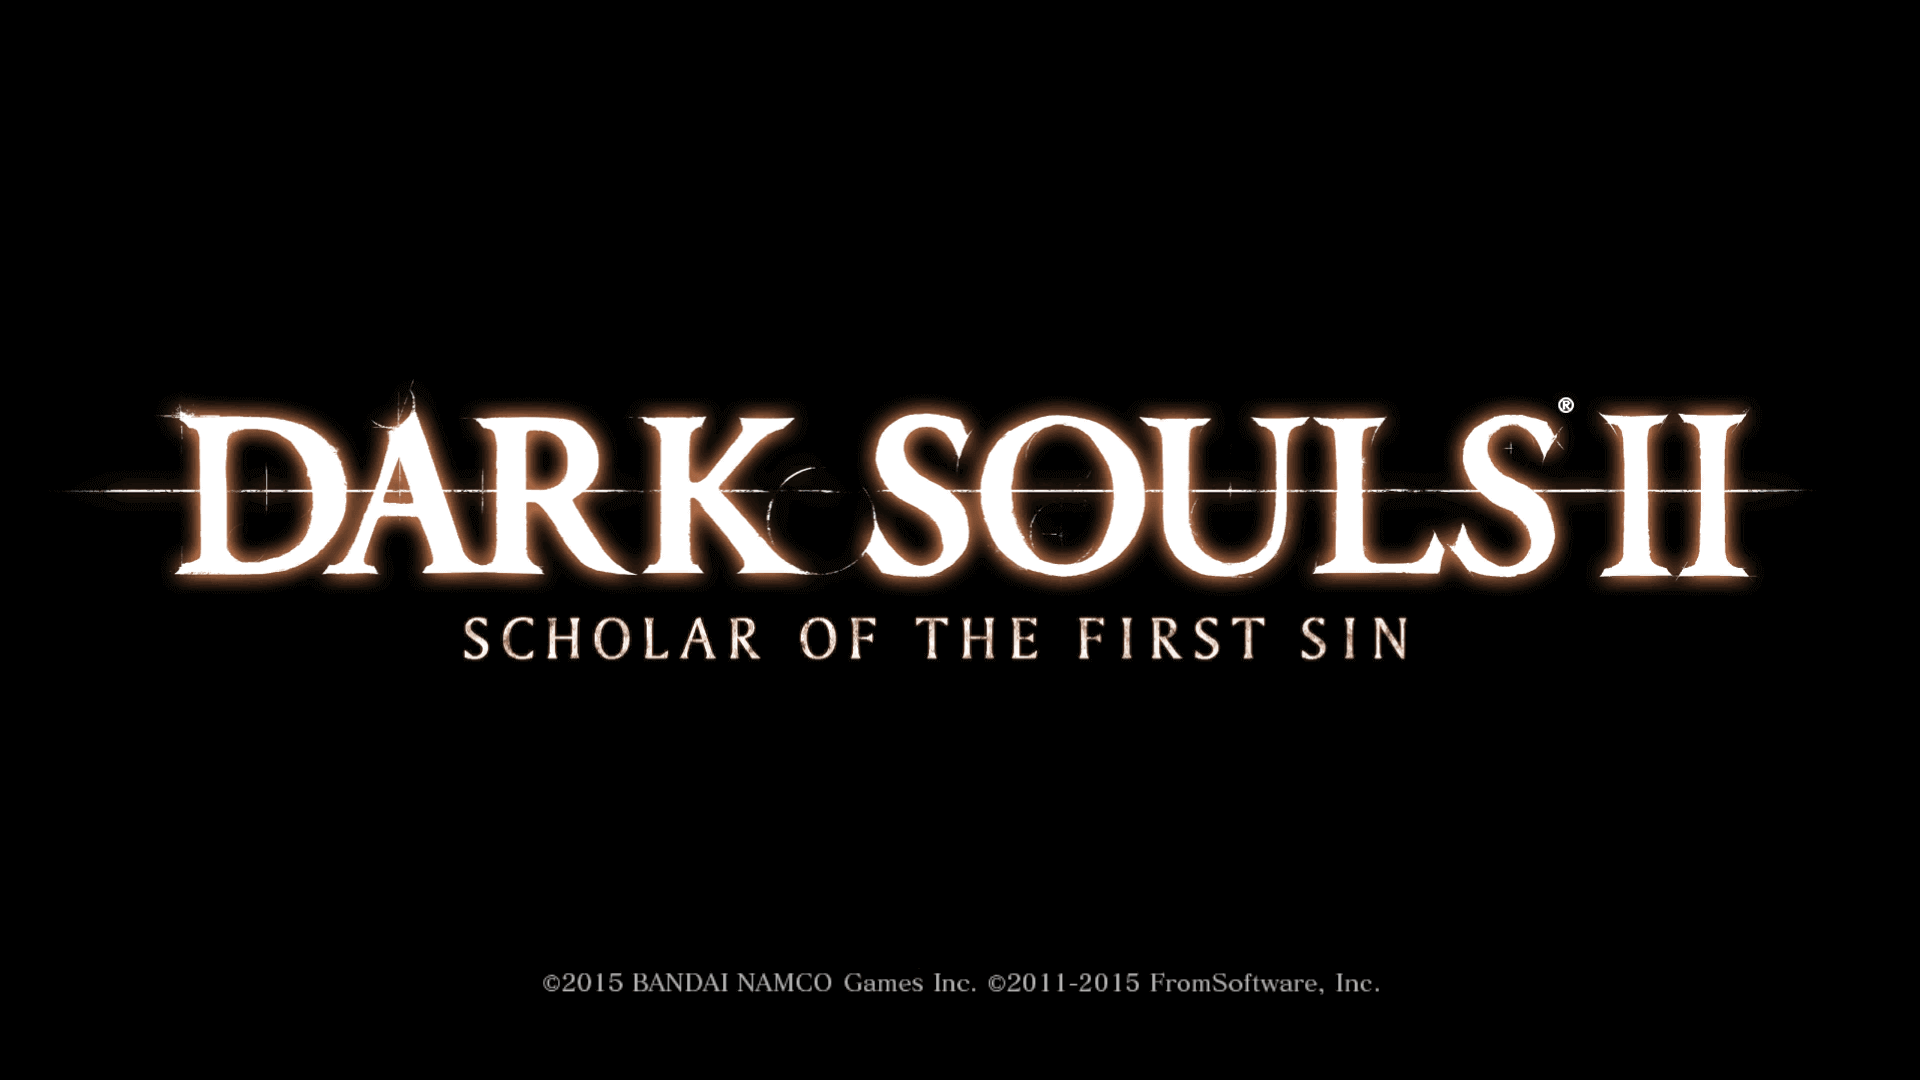 PC ゲーム DARK SOULS II SCHOLAR OF THE FIRST SIN のセーブデータを自動的にバックアップする方法